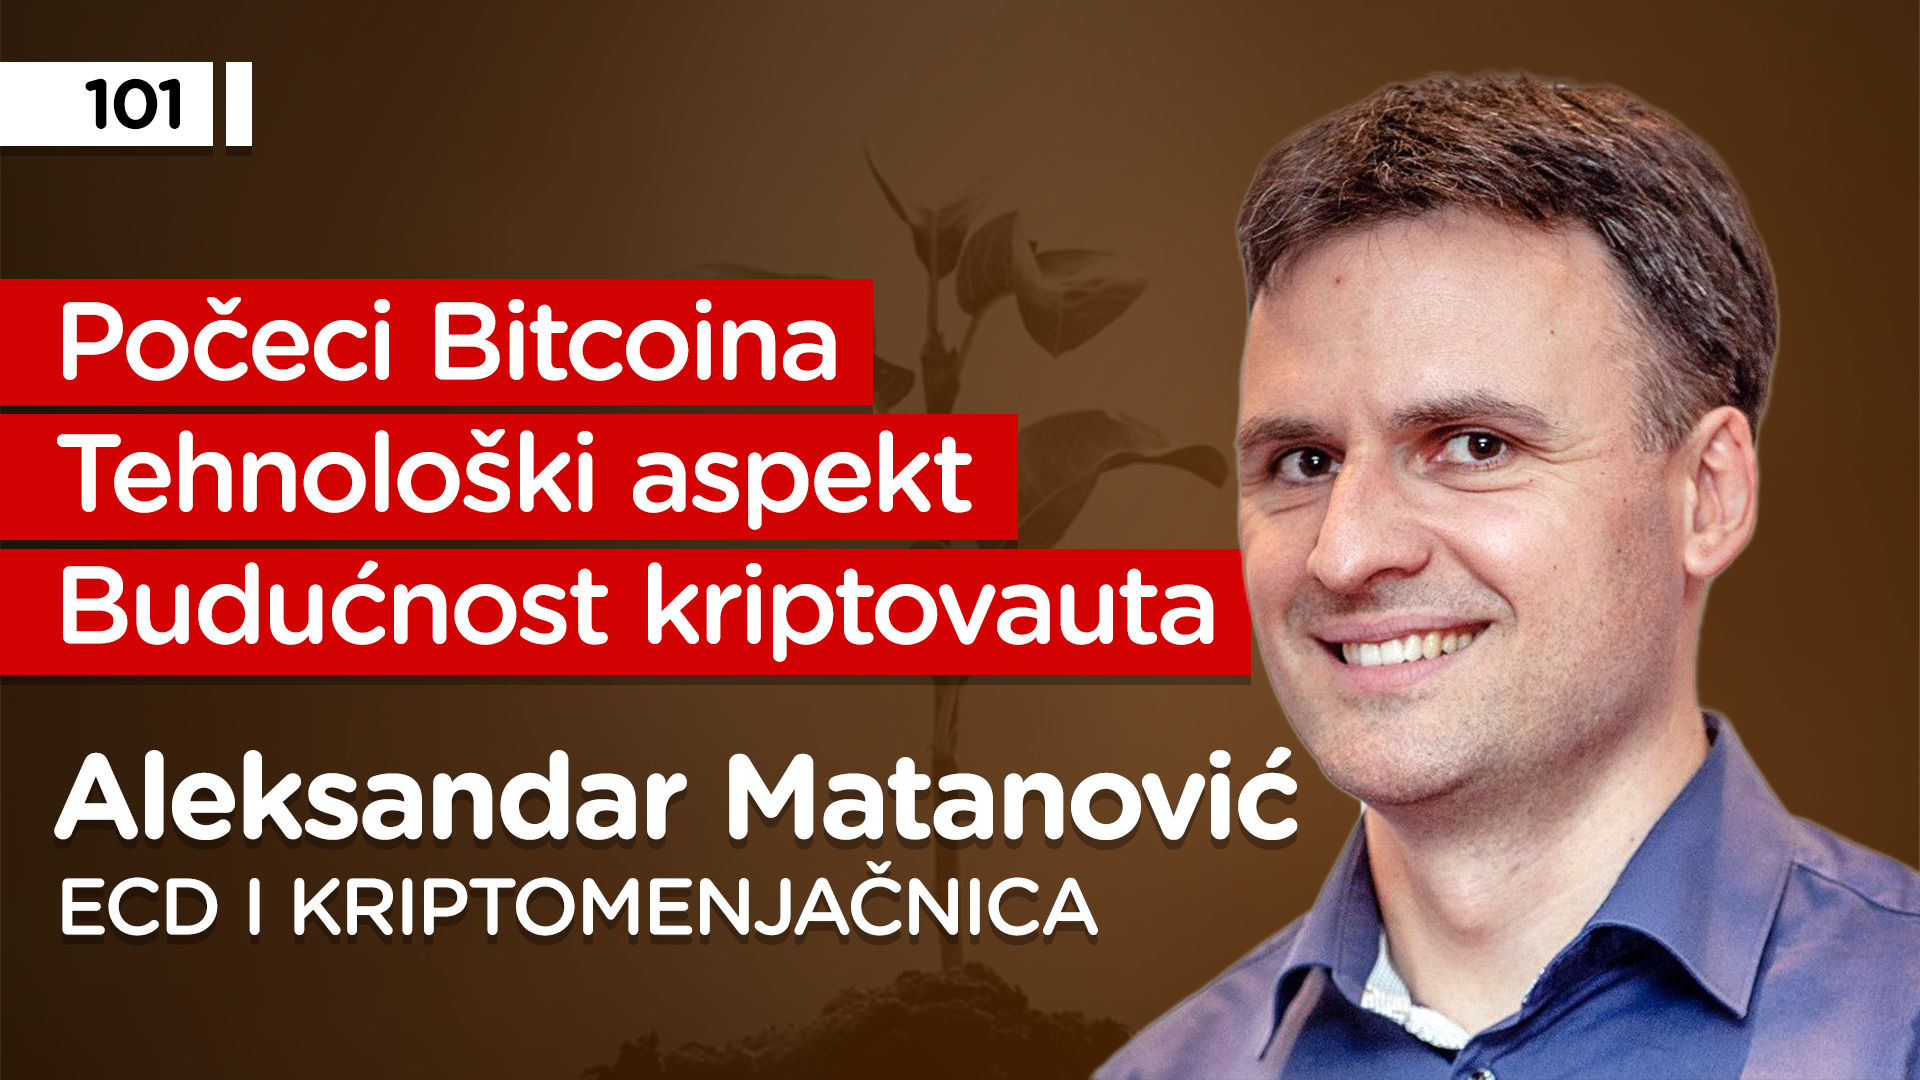 EP101: Aleksandar Matanović